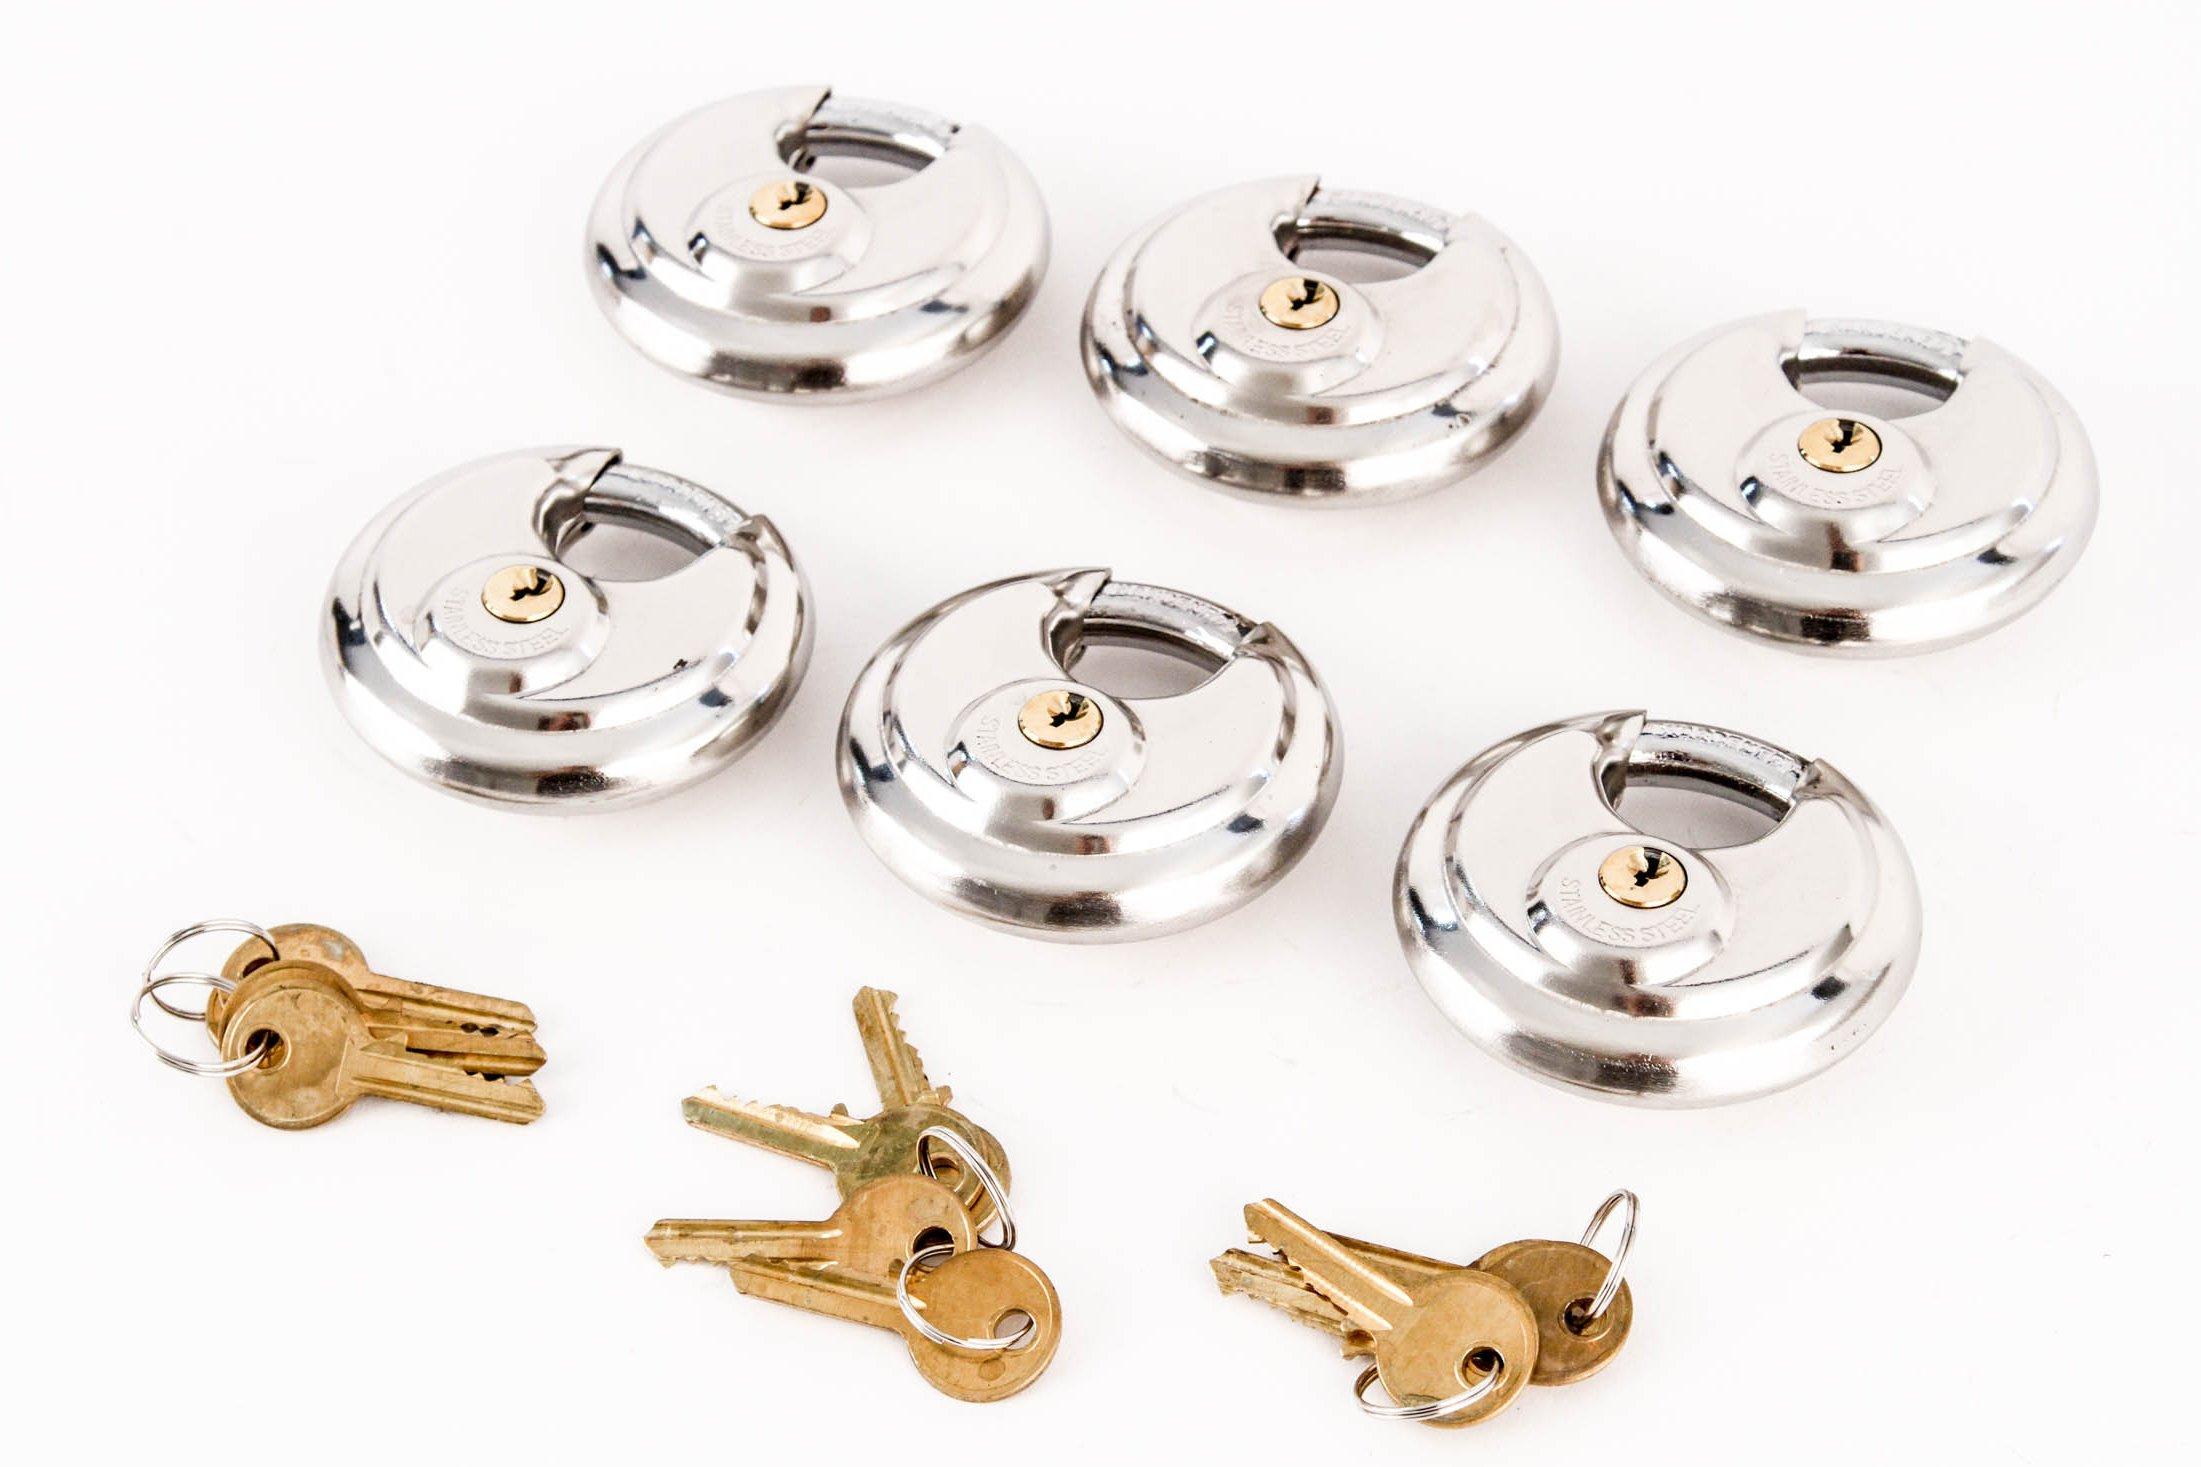 Red Hound Auto 6 Armor Disc Padlock Trailer Brass Cylinder Storage Locks Stainless Keyed Same by Red Hound Auto (Image #3)